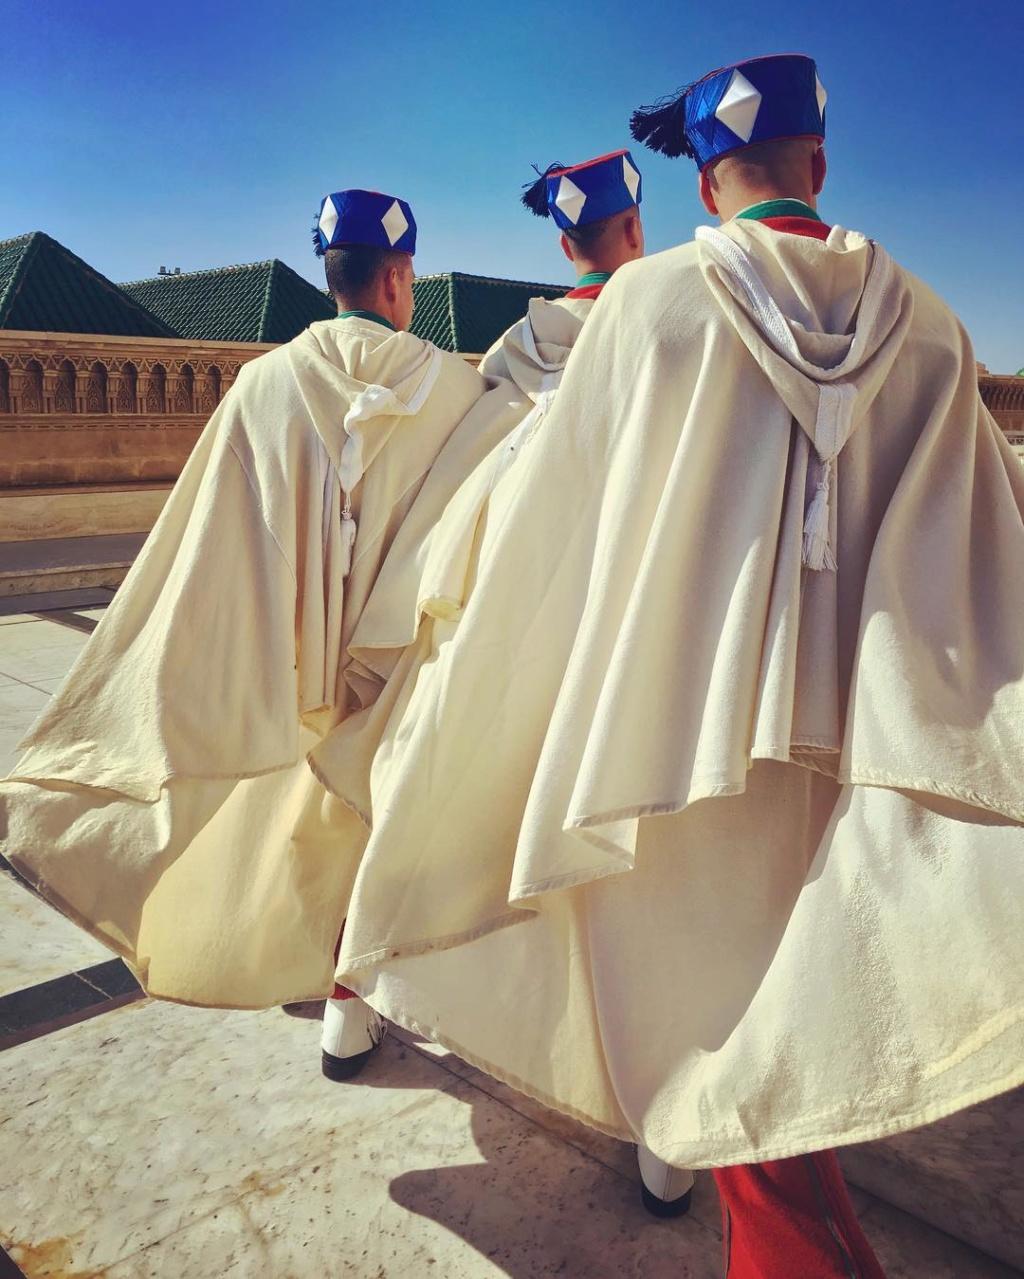 La Garde Royale Marocaine / Moroccan Royal Guard - Page 11 Sian3j10